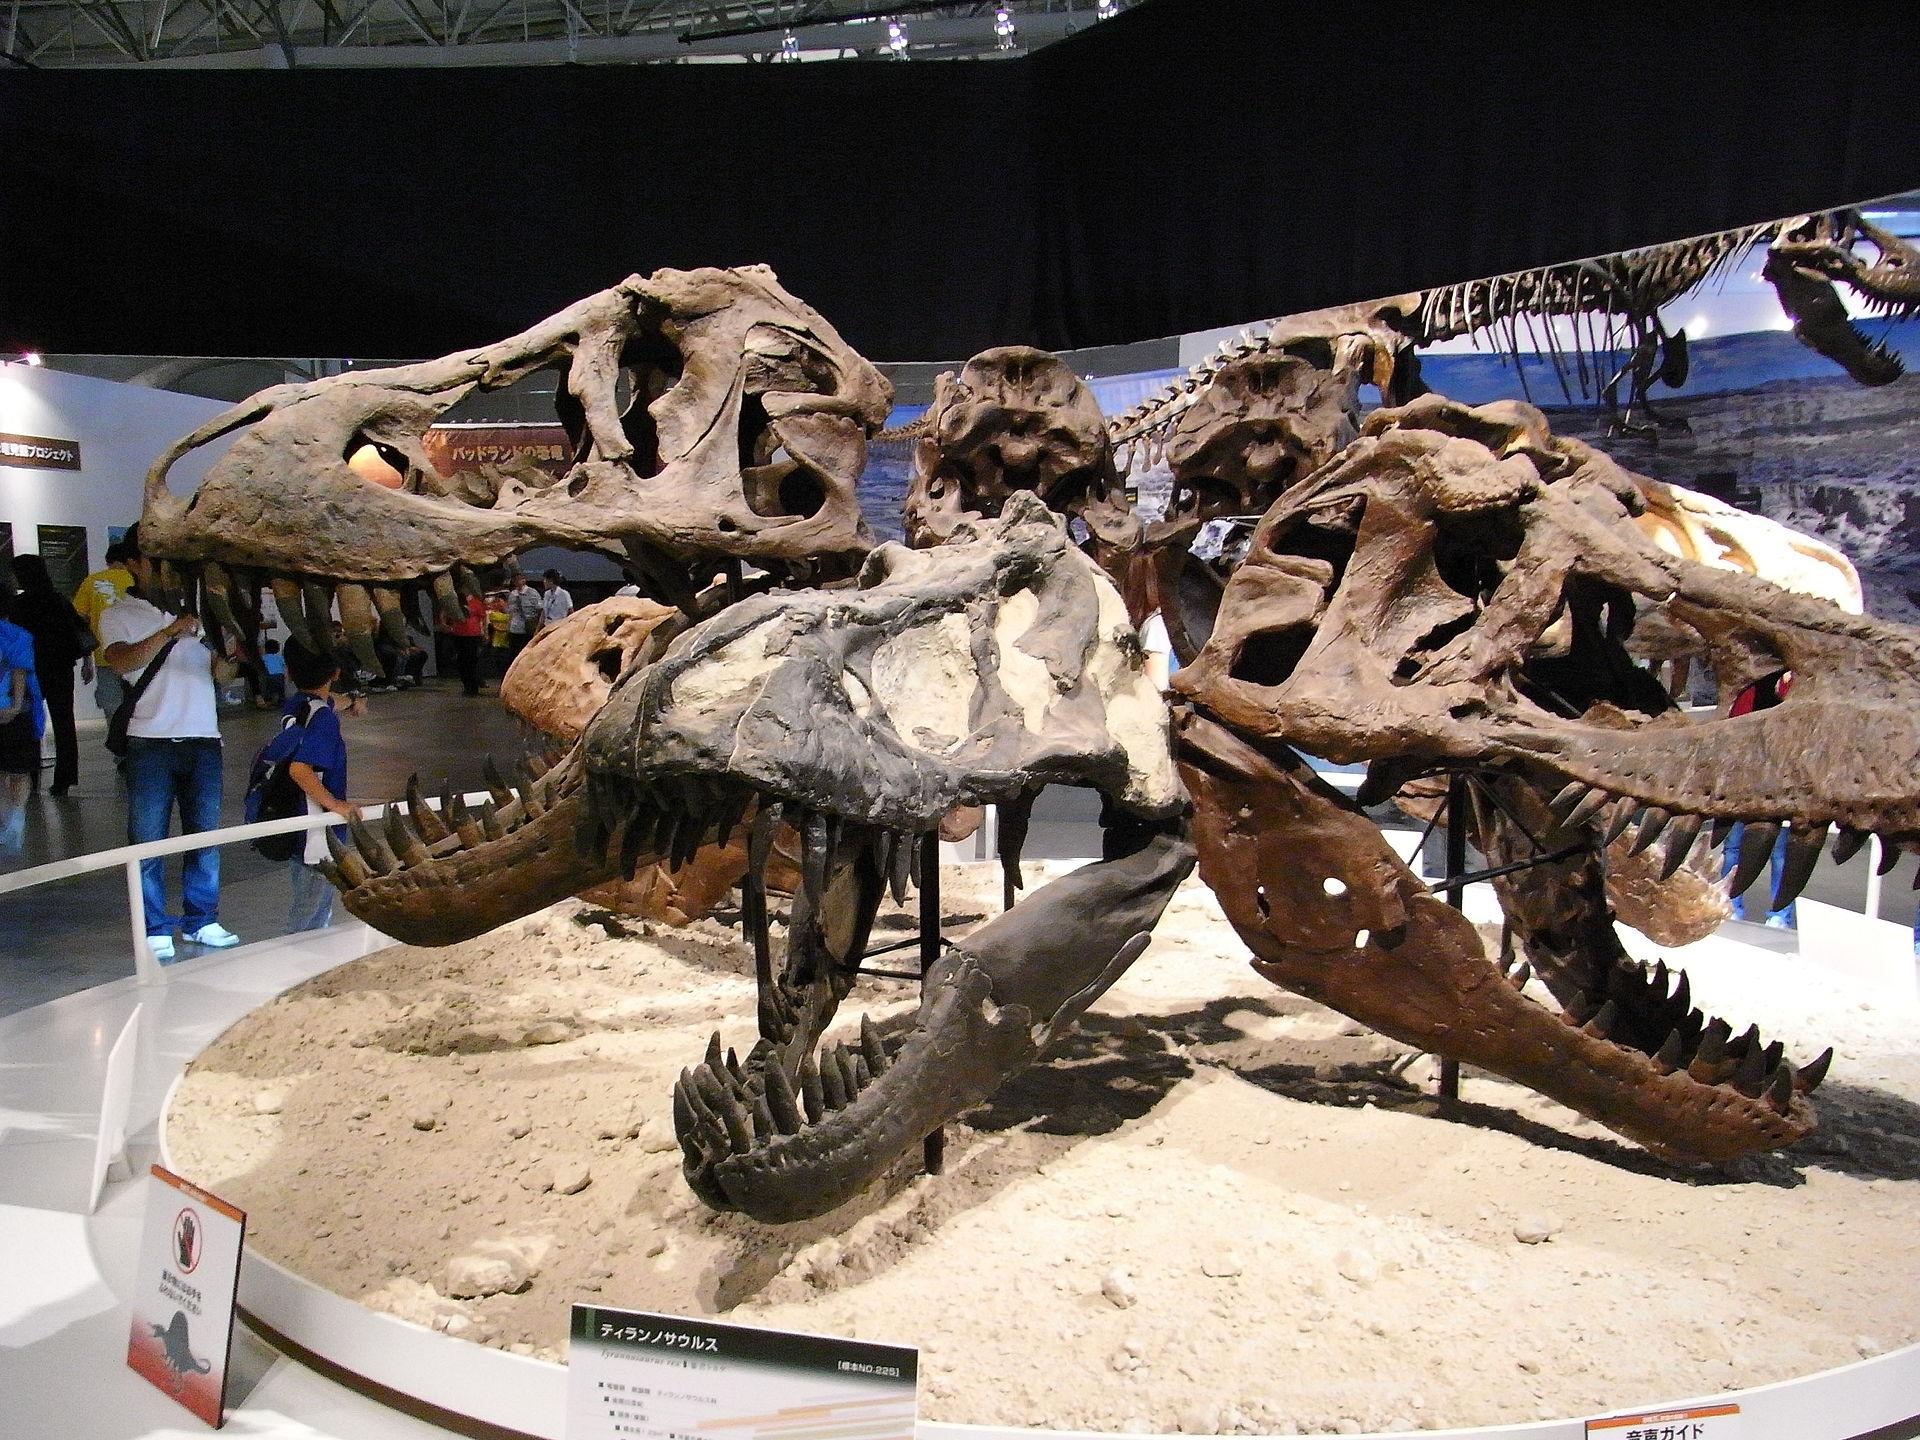 Crânes de Tyrannosaures